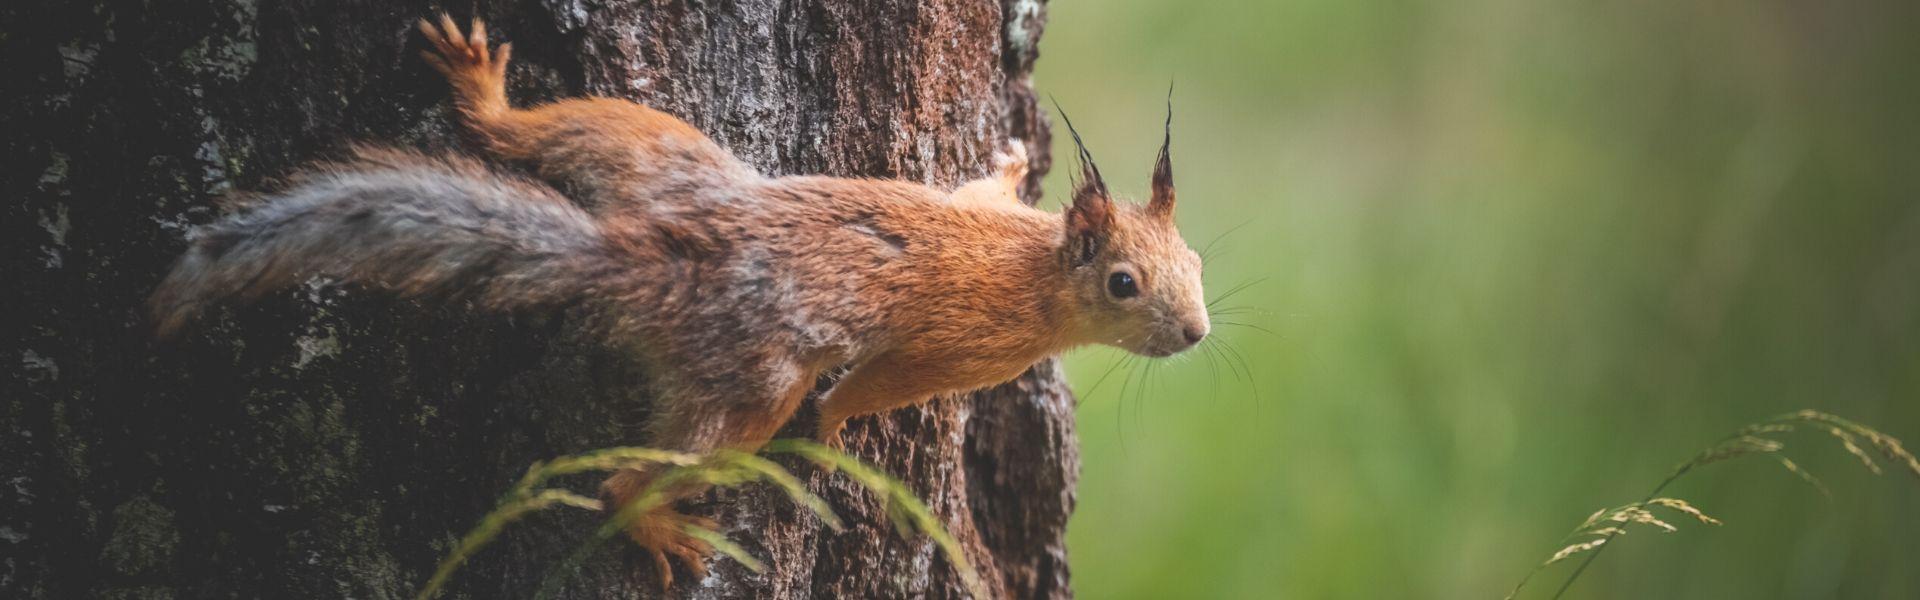 suvine loodus, orav puutüvel